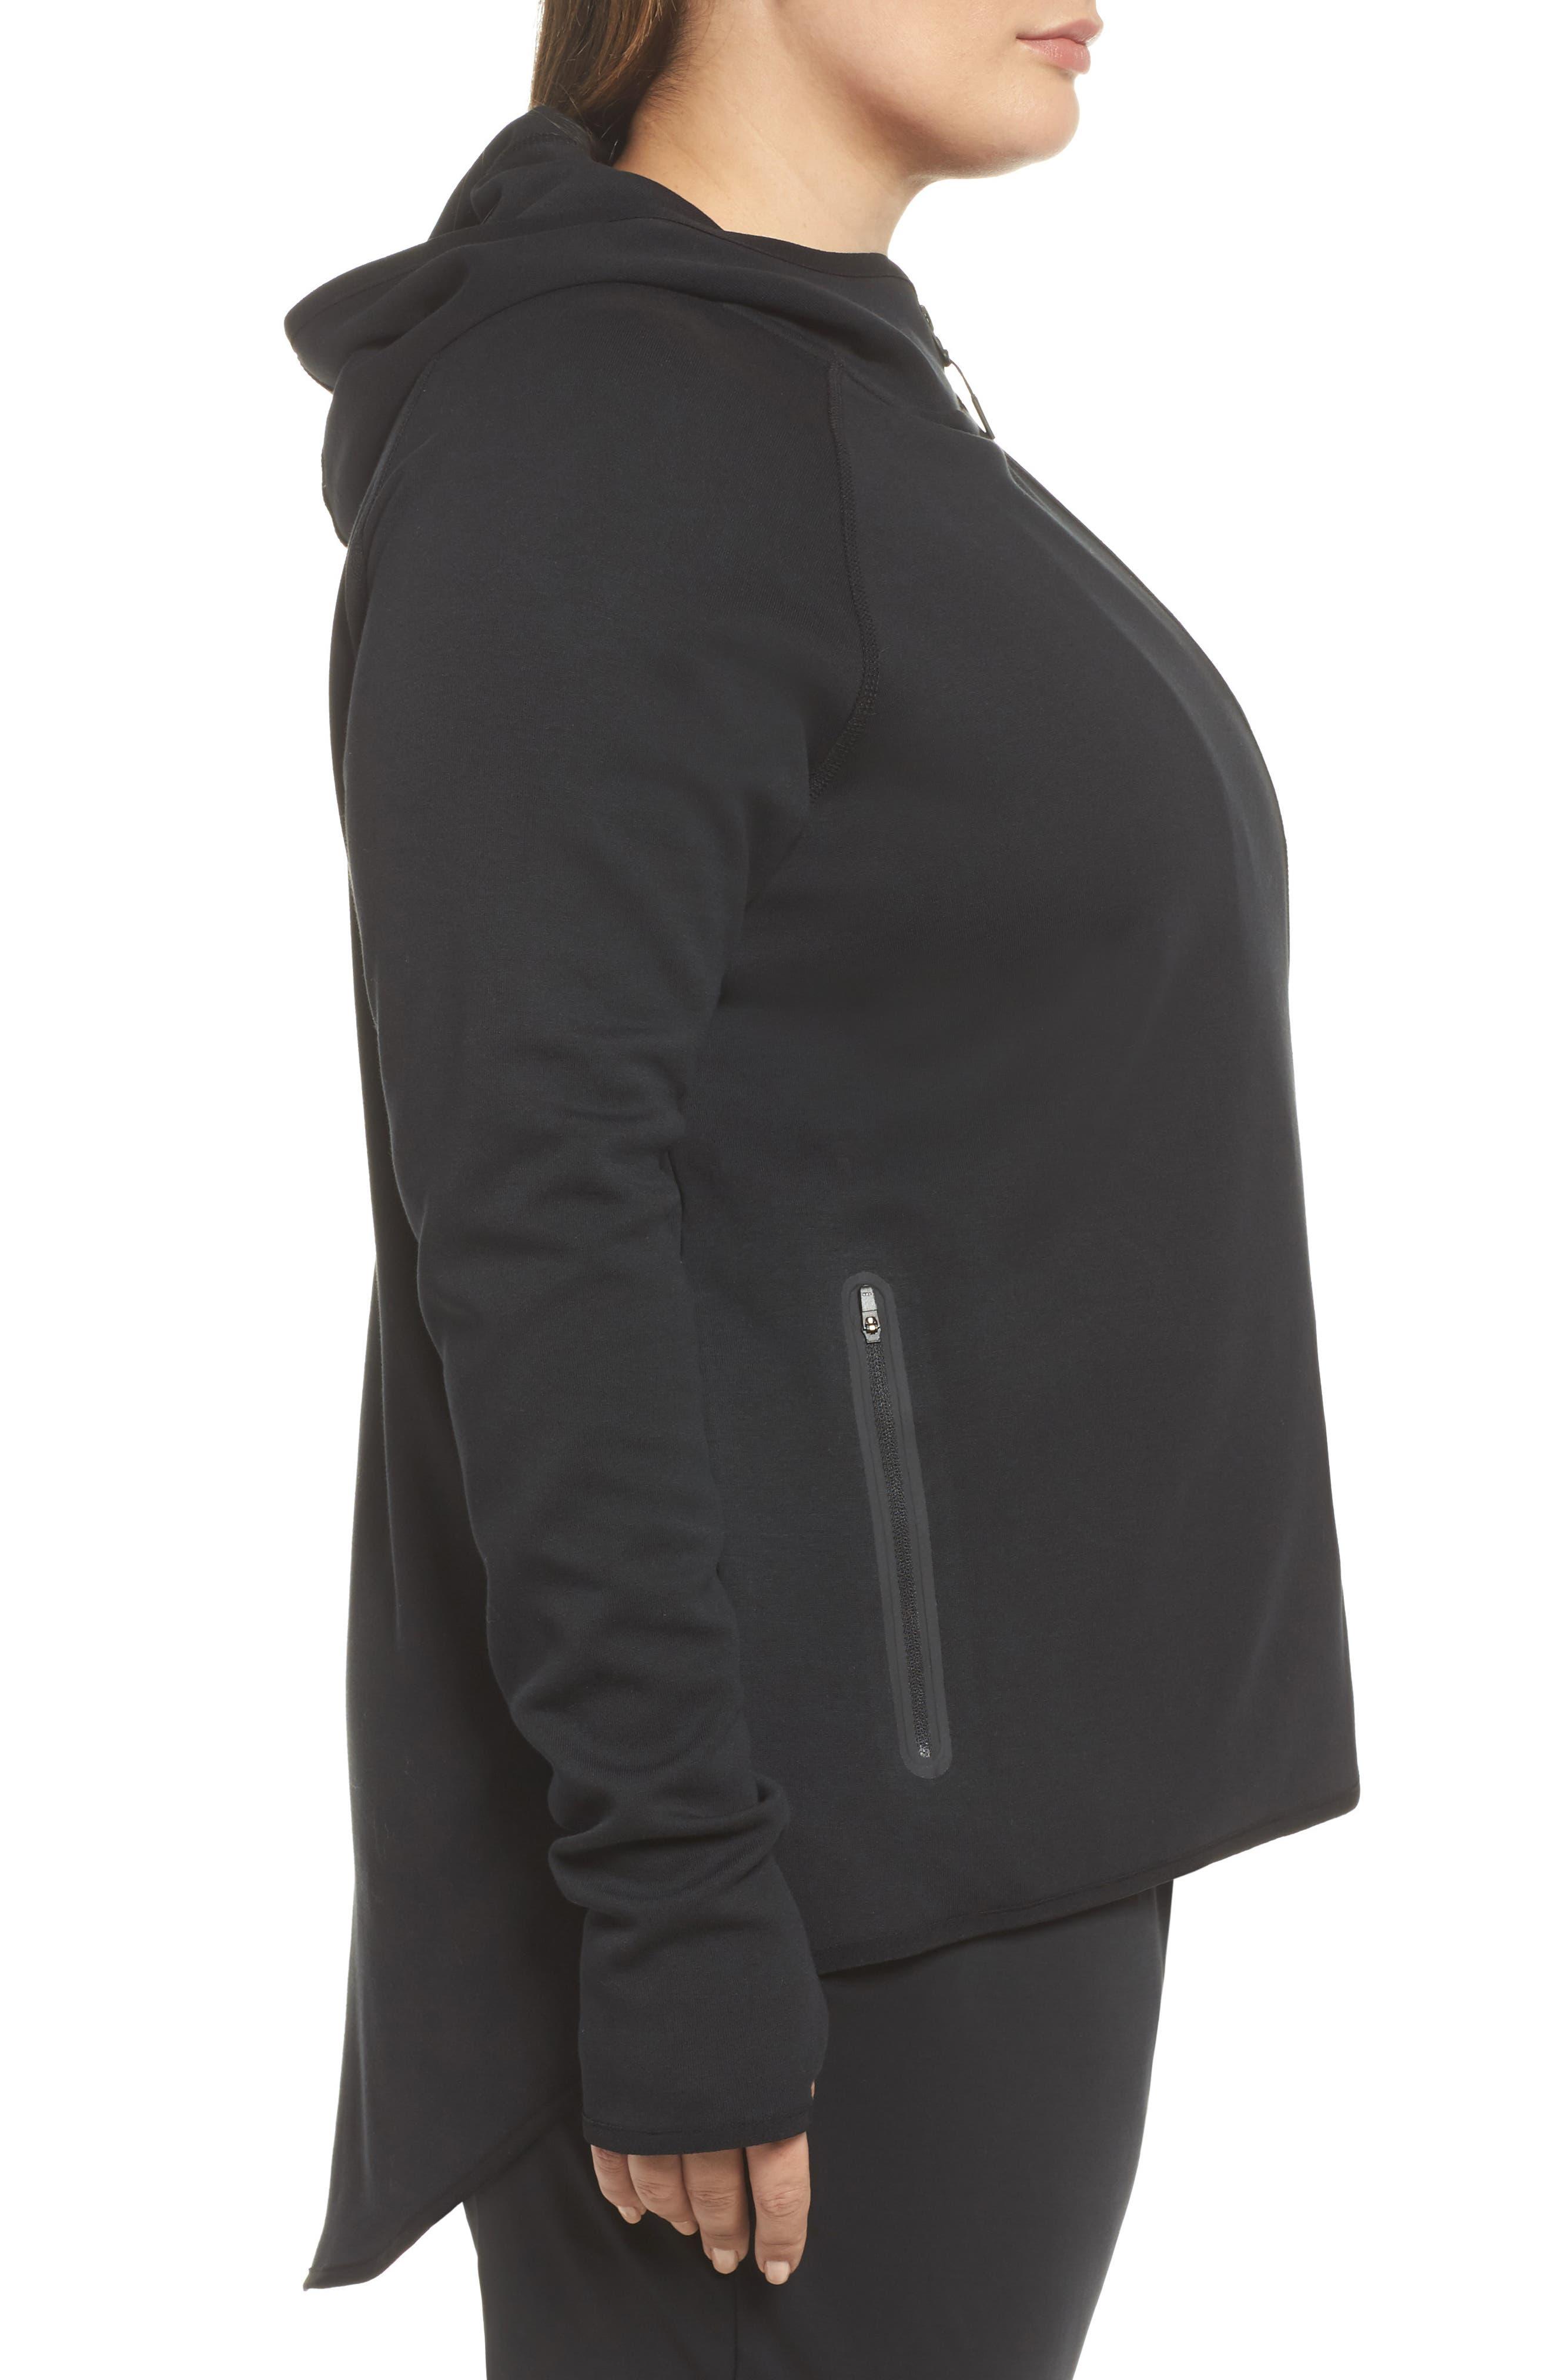 Sportswear Tech Fleece Zip Cape,                             Alternate thumbnail 3, color,                             Black/ Black